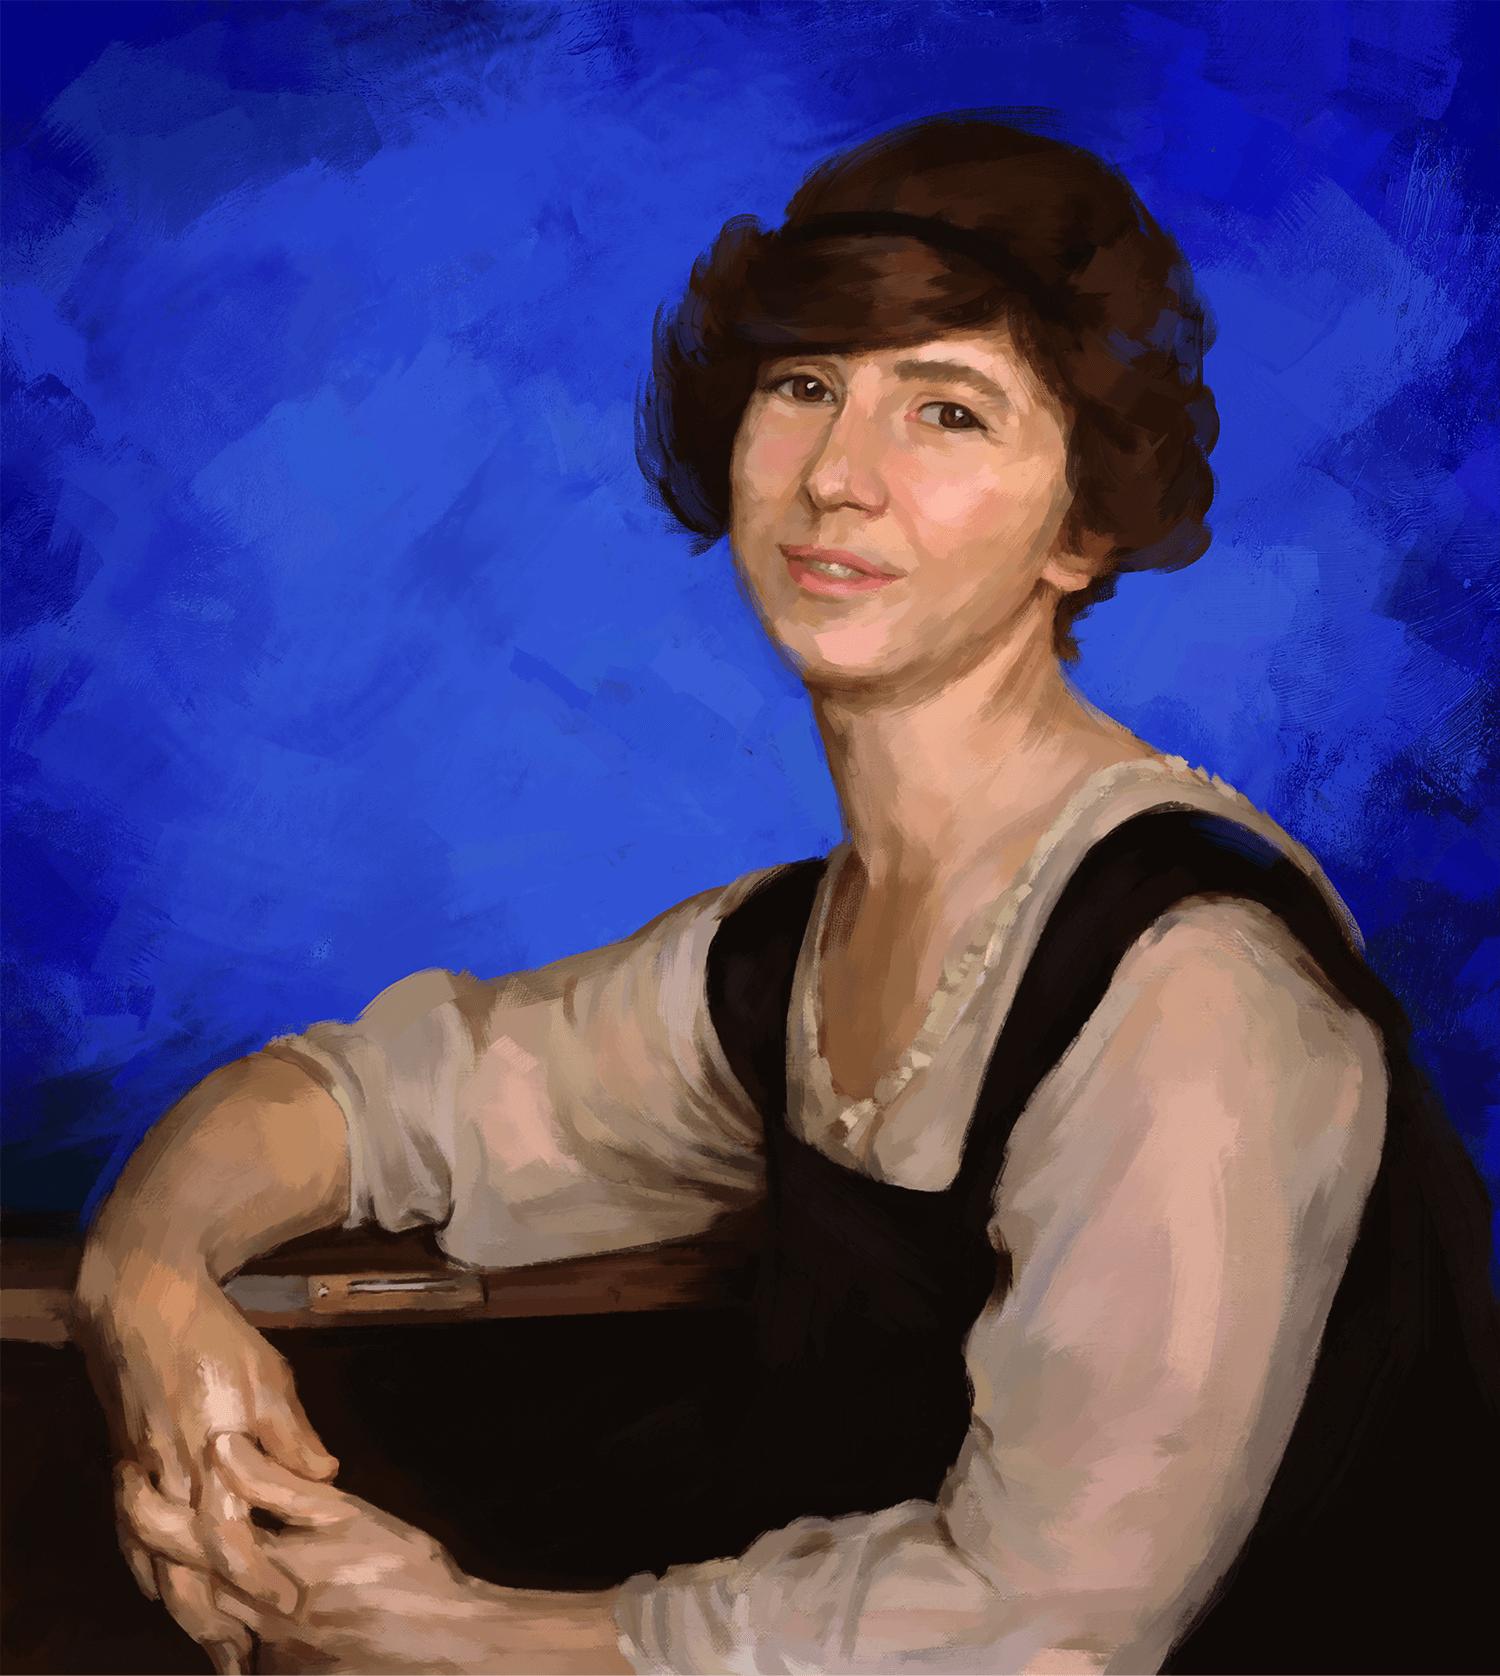 freya_stark_oil_painting_1500x1676